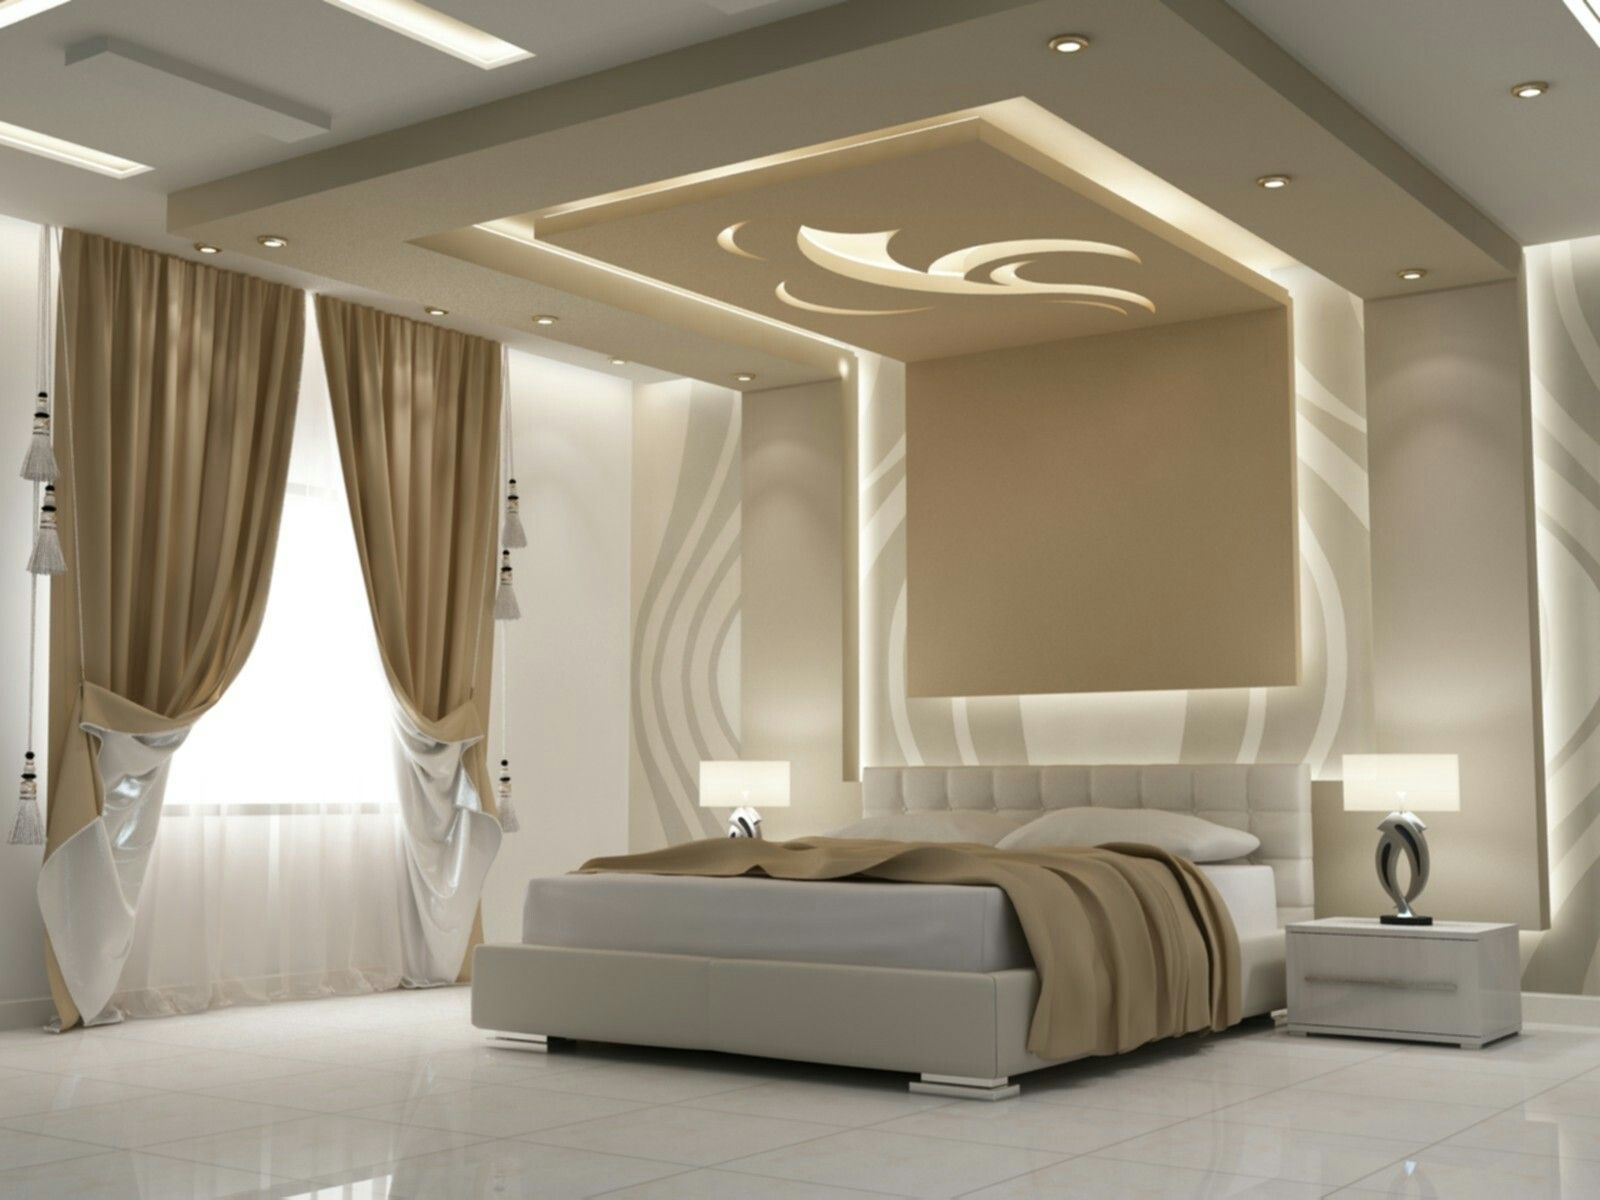 Master bedroom gypsum ceiling  Pin by Anička Ananasik Koričárová on Dom  Pinterest